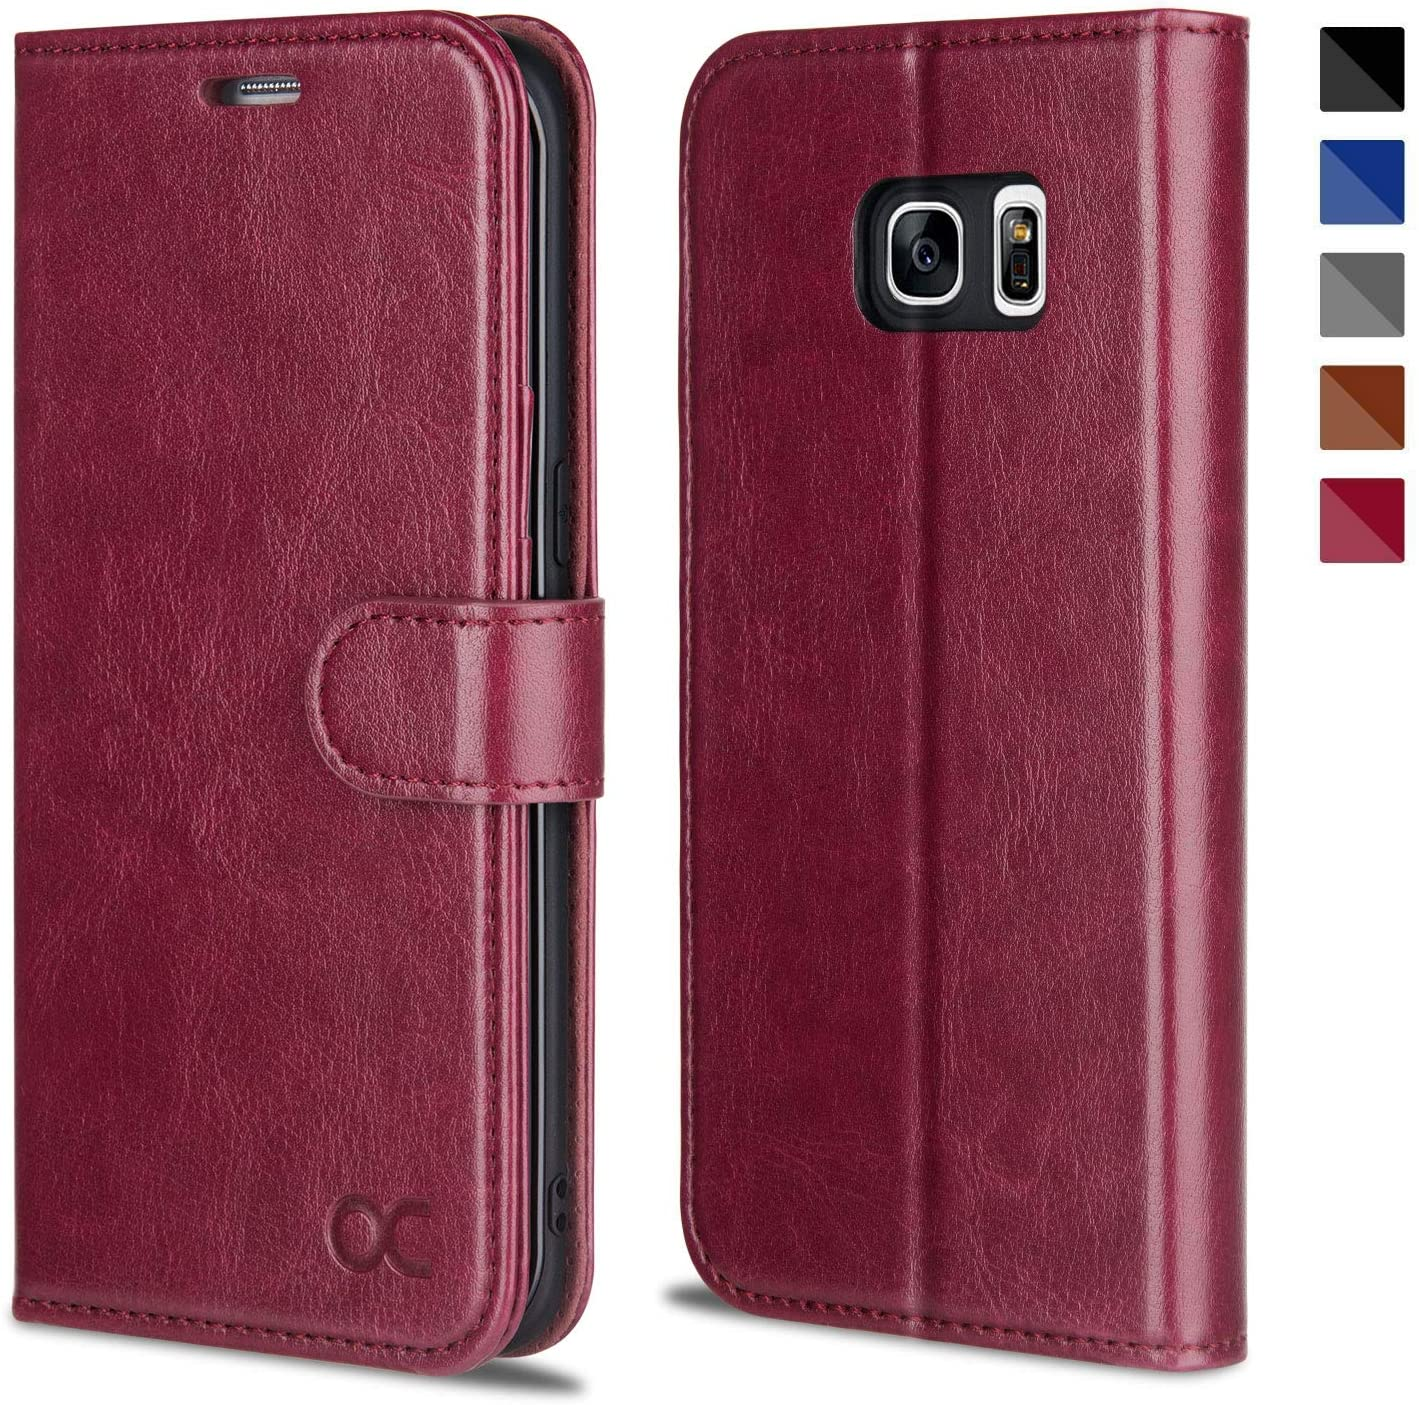 OCASE Galaxy S7 Edge Case [TPU Shockproof Interior Protective Case] [Card Slot] [Kickstand] Leather Wallet Flip Case Samsung Galaxy S7 Edge (Burgundy)